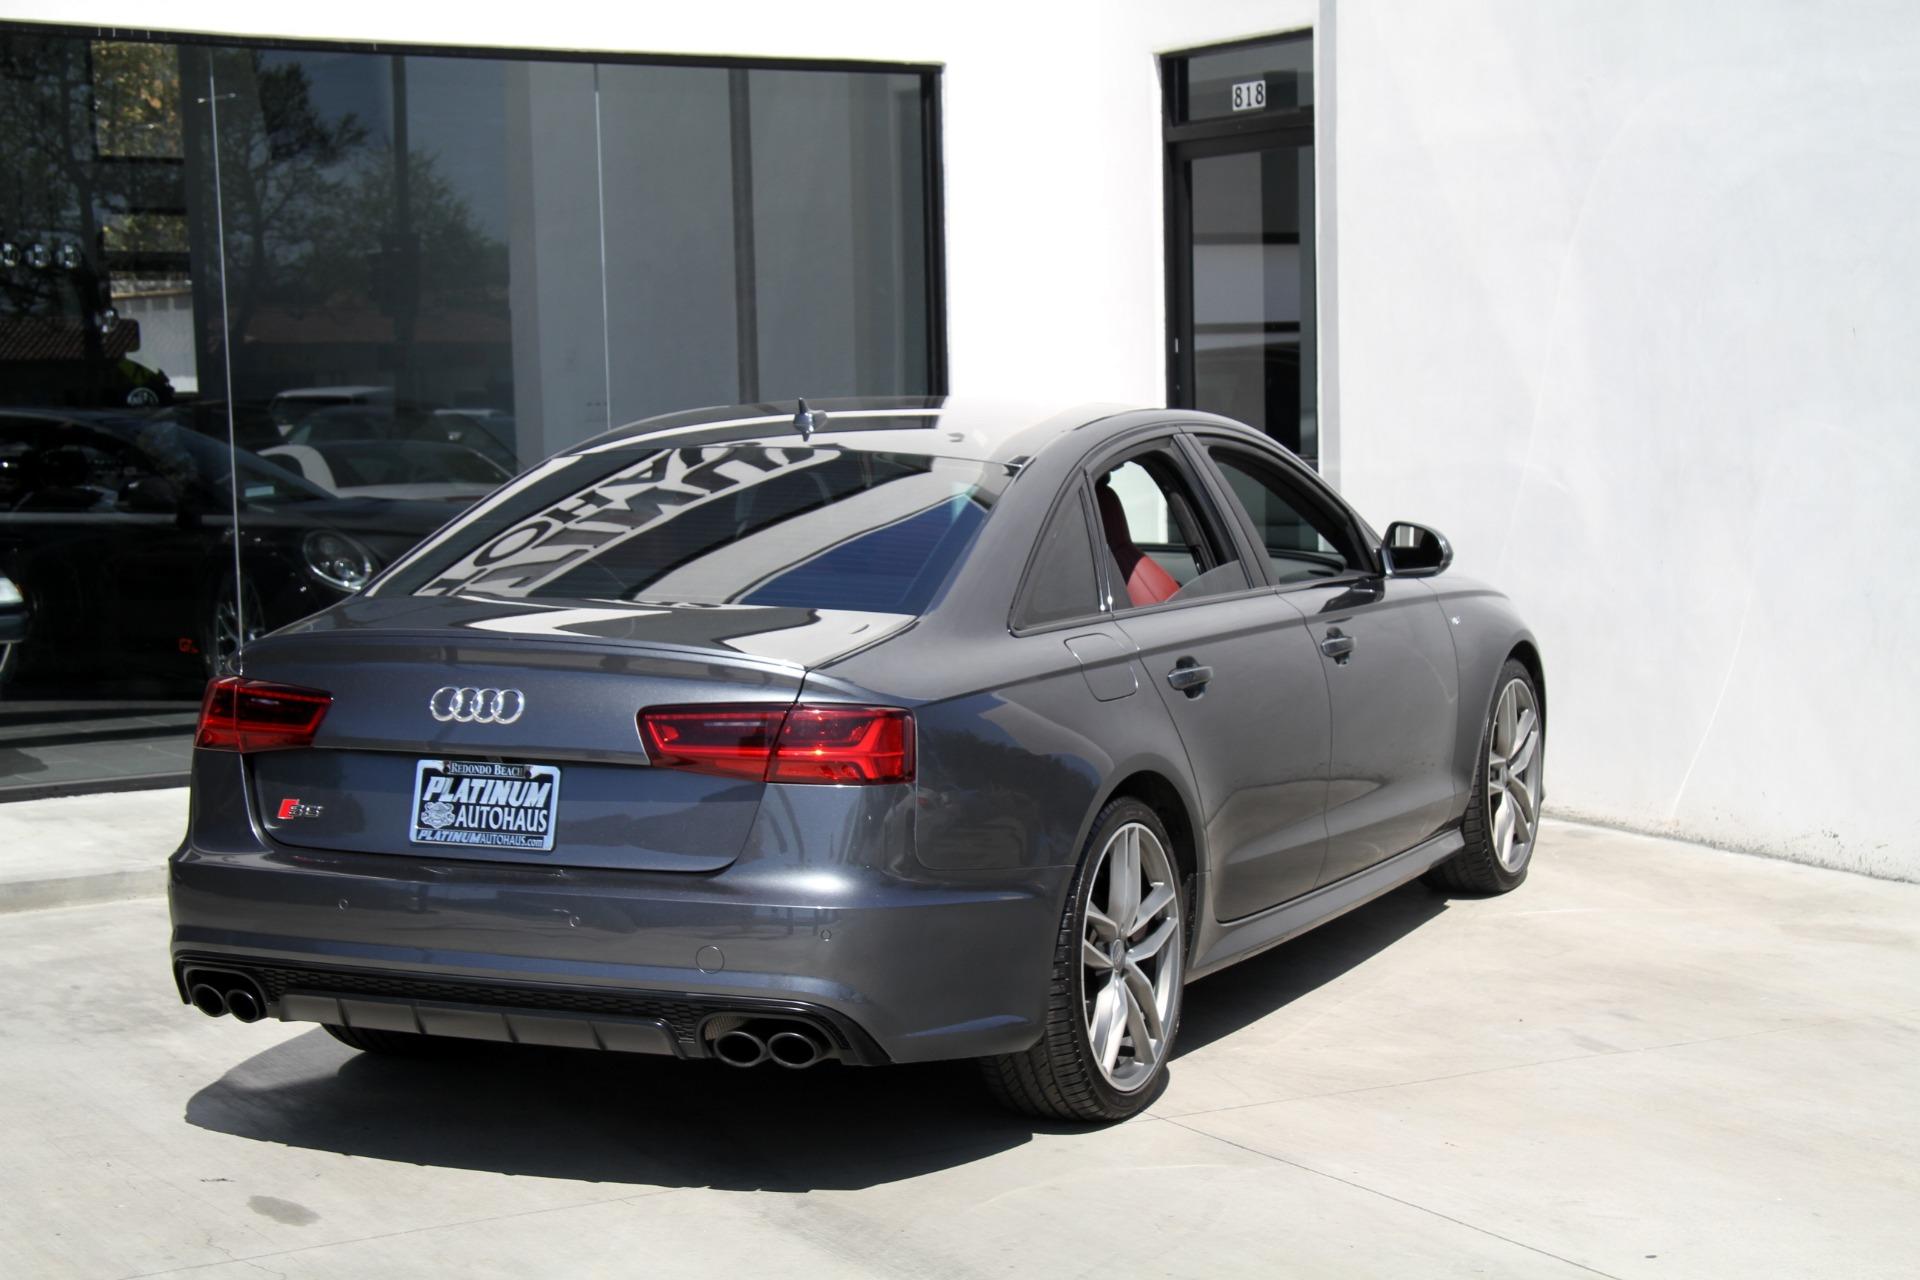 Audi Dealership Near Me >> 2016 Audi S6 4.0T quattro Prestige Stock # 6102 for sale near Redondo Beach, CA | CA Audi Dealer